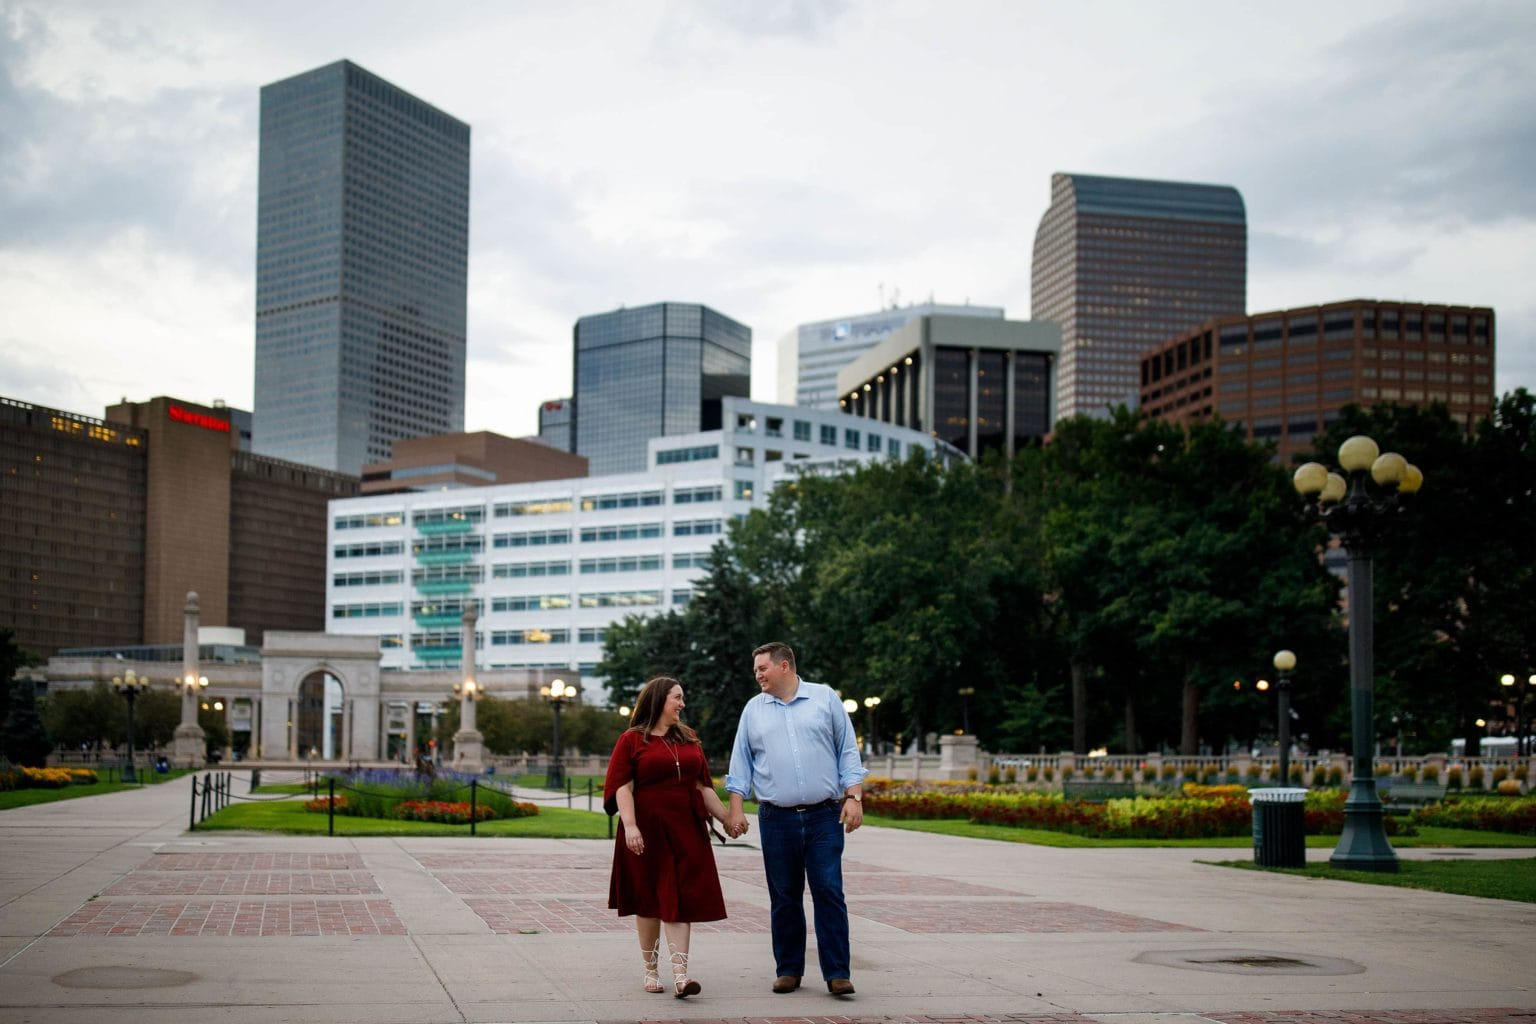 Civic Center Park